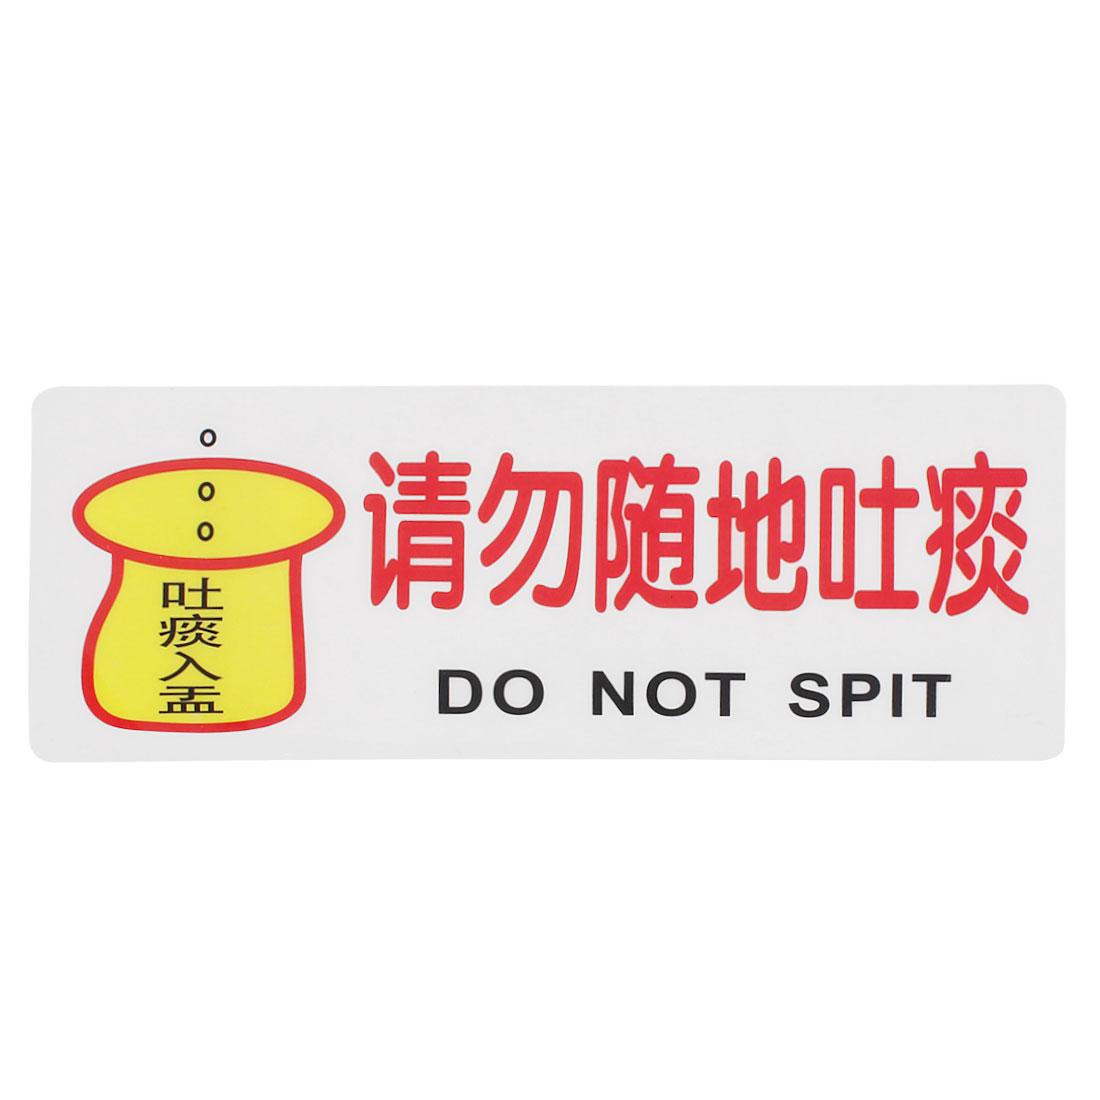 Public Places Plastic Self Adhesive Do Not Spit Prohibit Healthcare Sign Car Notice Sticker Decal